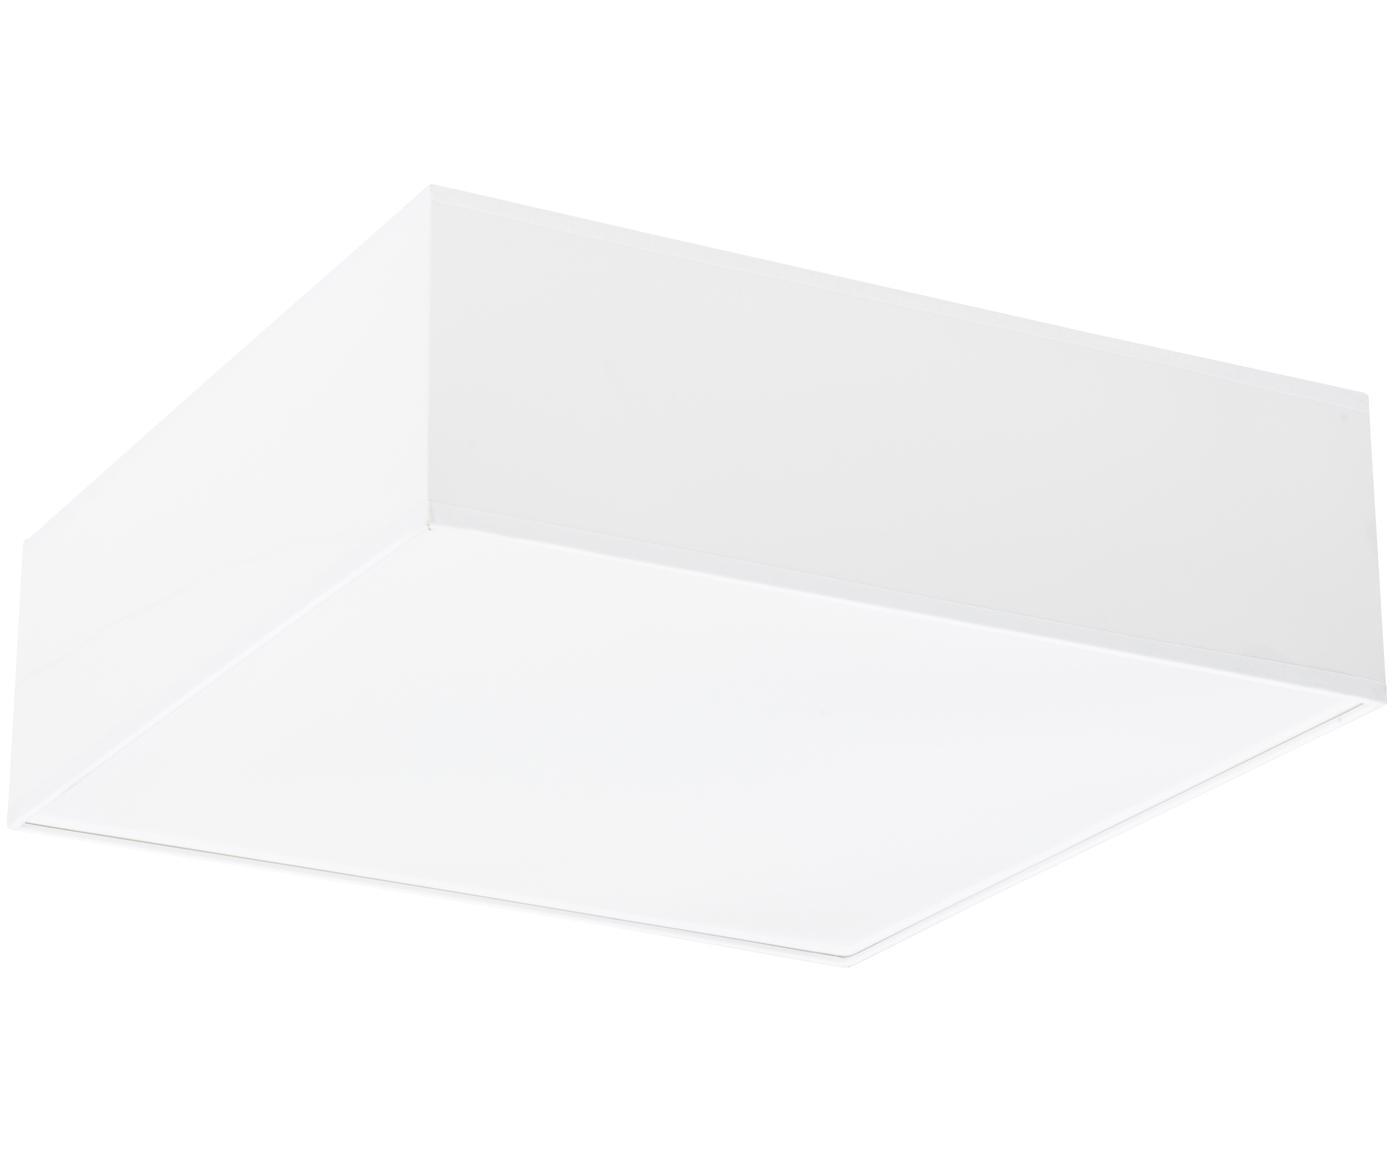 Plafoniera Mitra, Materiale sintetico (PVC), Struttura: bianco Diffusore: bianco, Larg. 35 x Alt. 12 cm